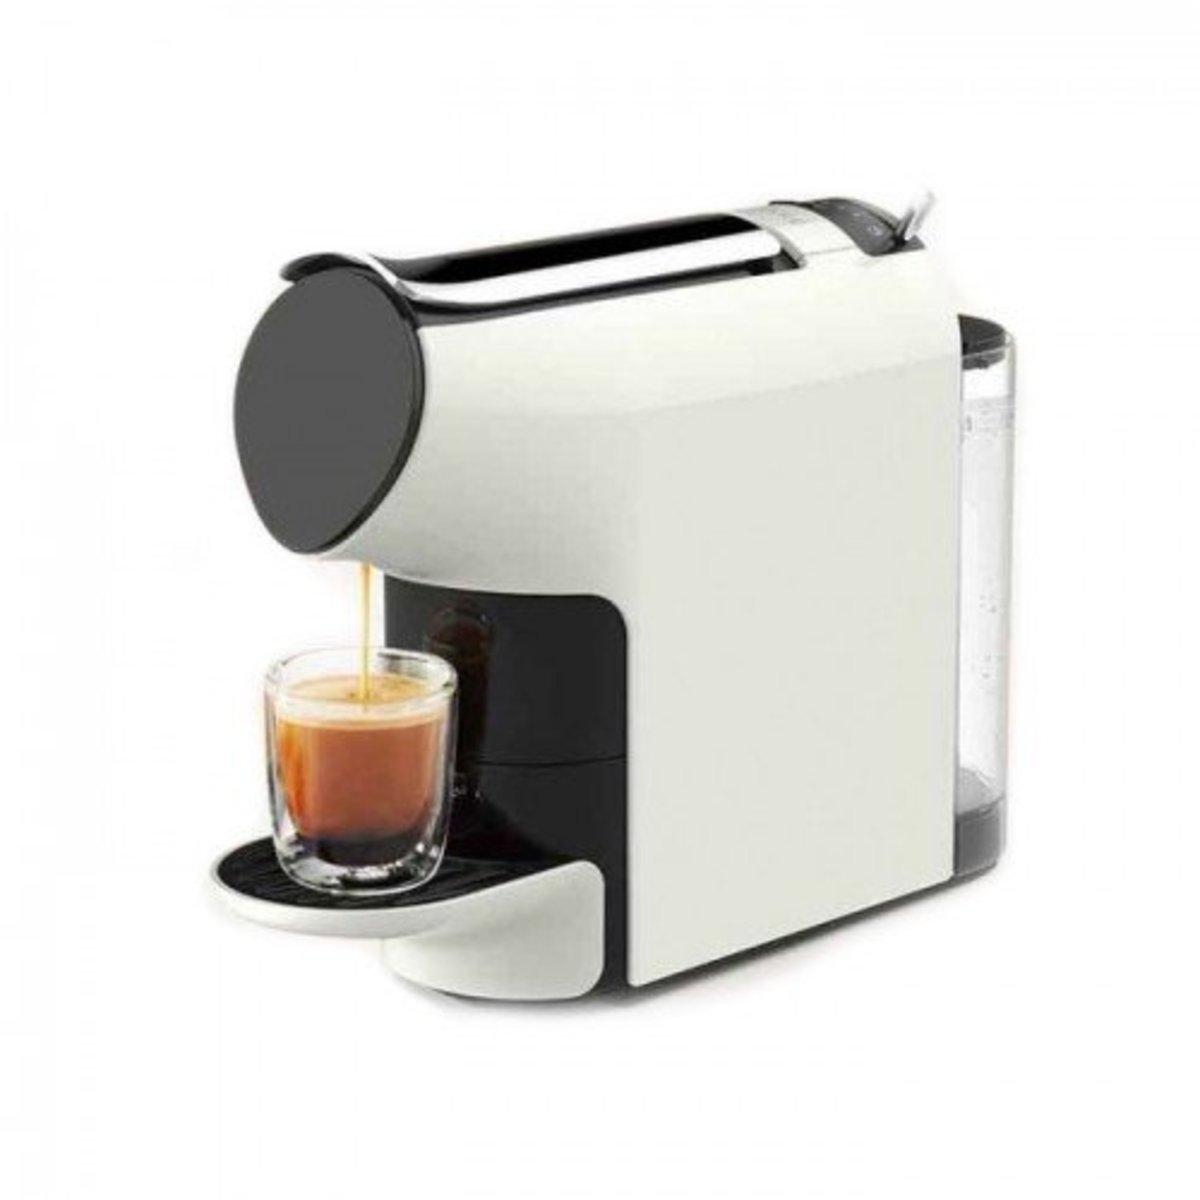 Mijia SCISHARE Smart Automatic Capsule Coffee Machine (White)